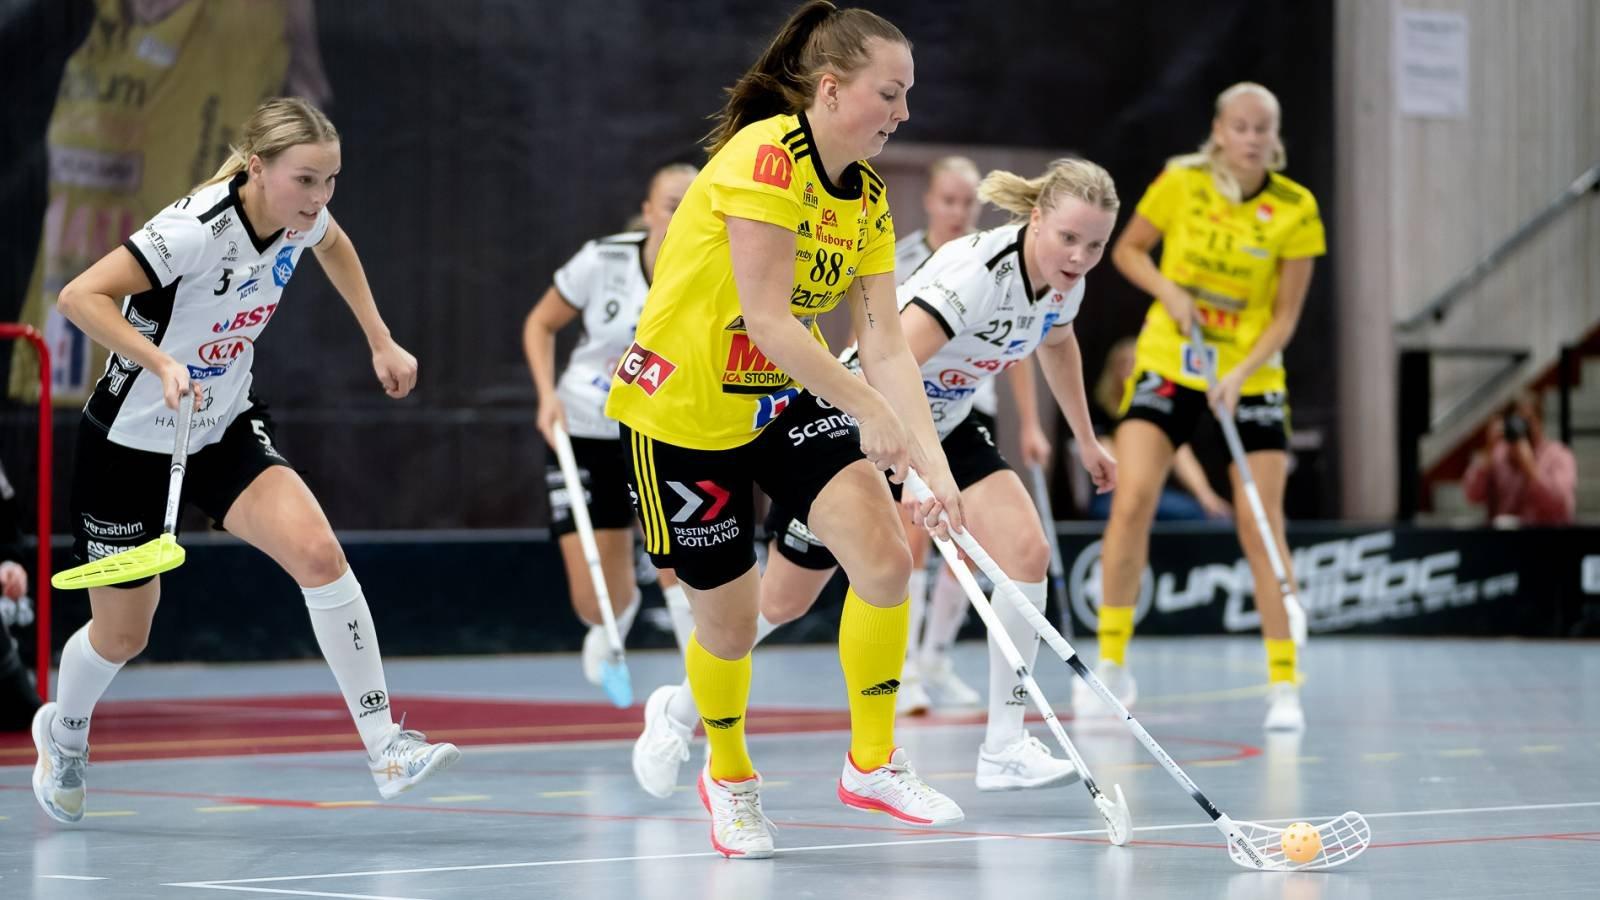 Highlights: Endre IF - Nacka Wallenstam IBK